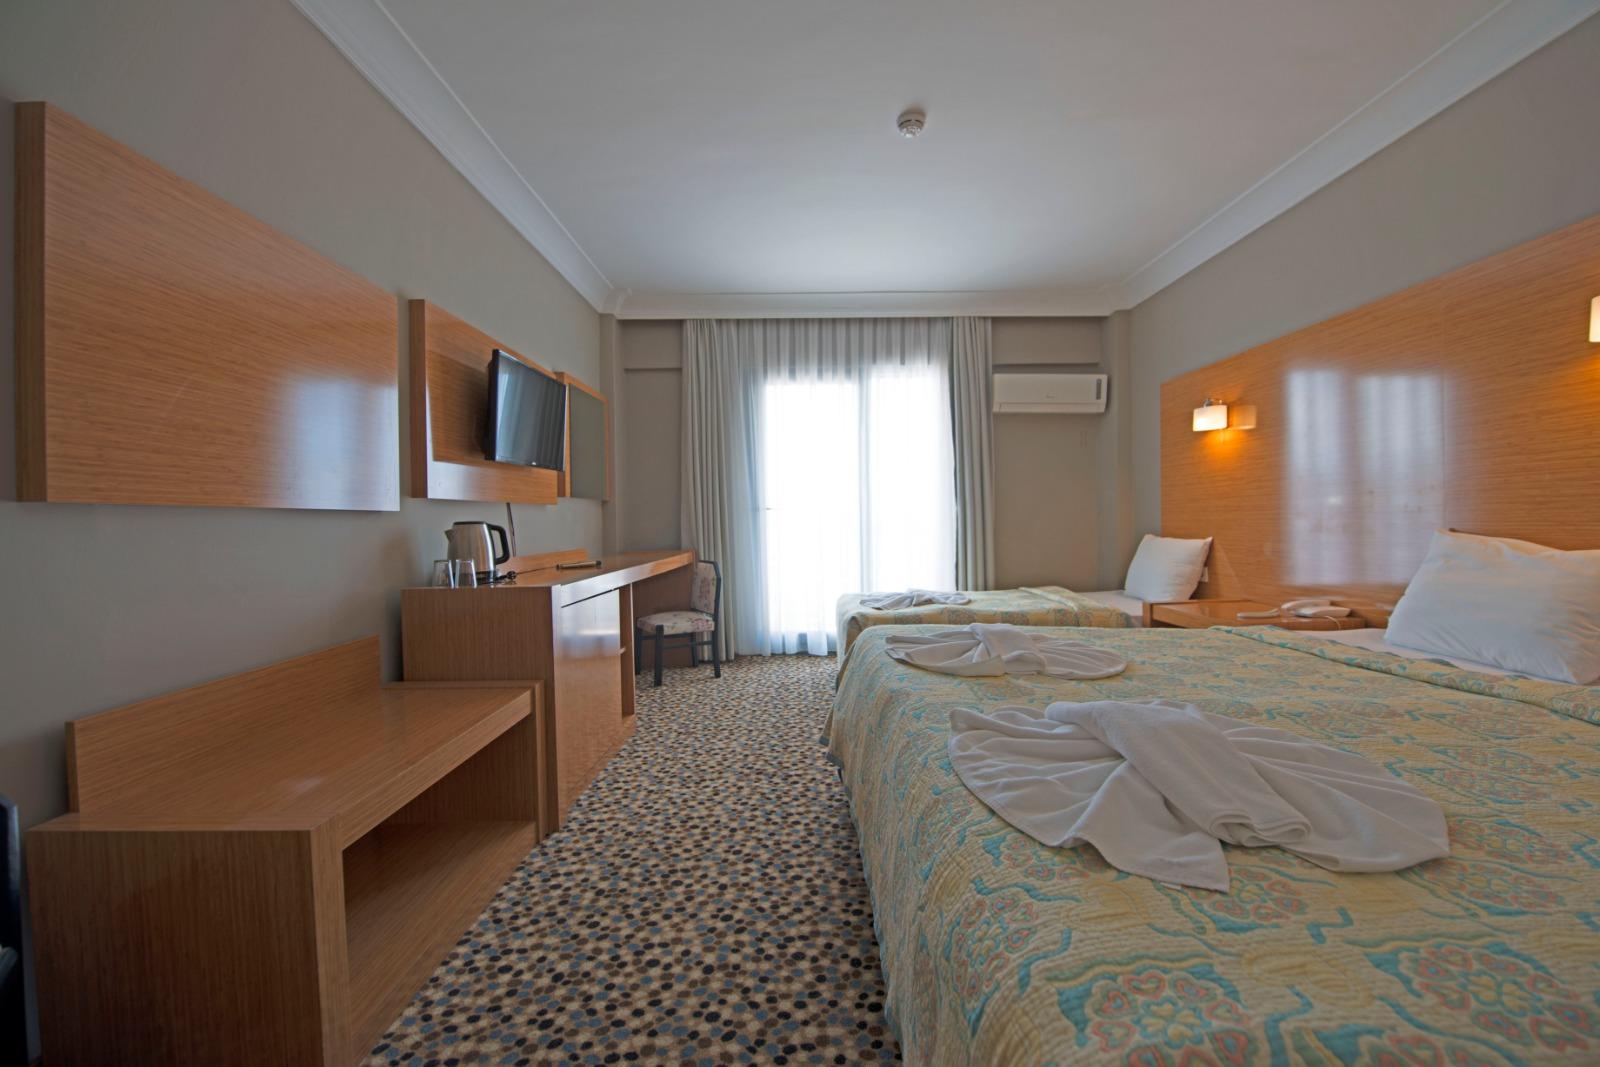 kusadasi ayma hotel 3